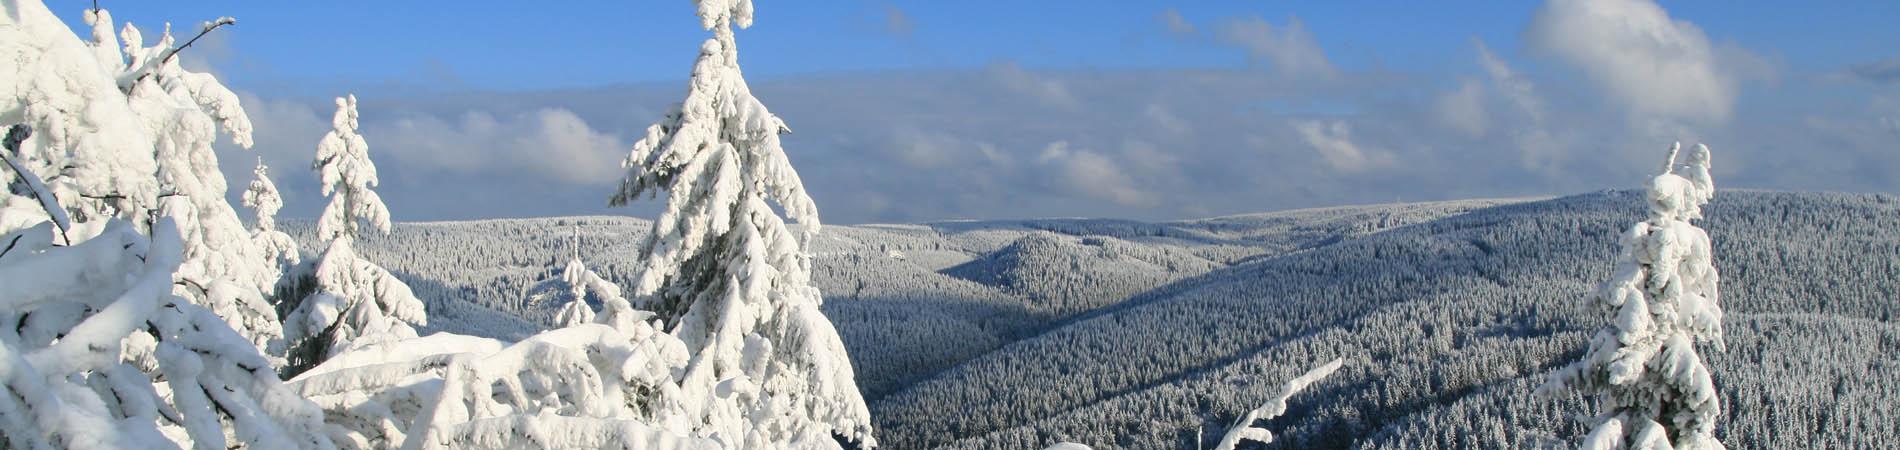 winter_berge.jpg